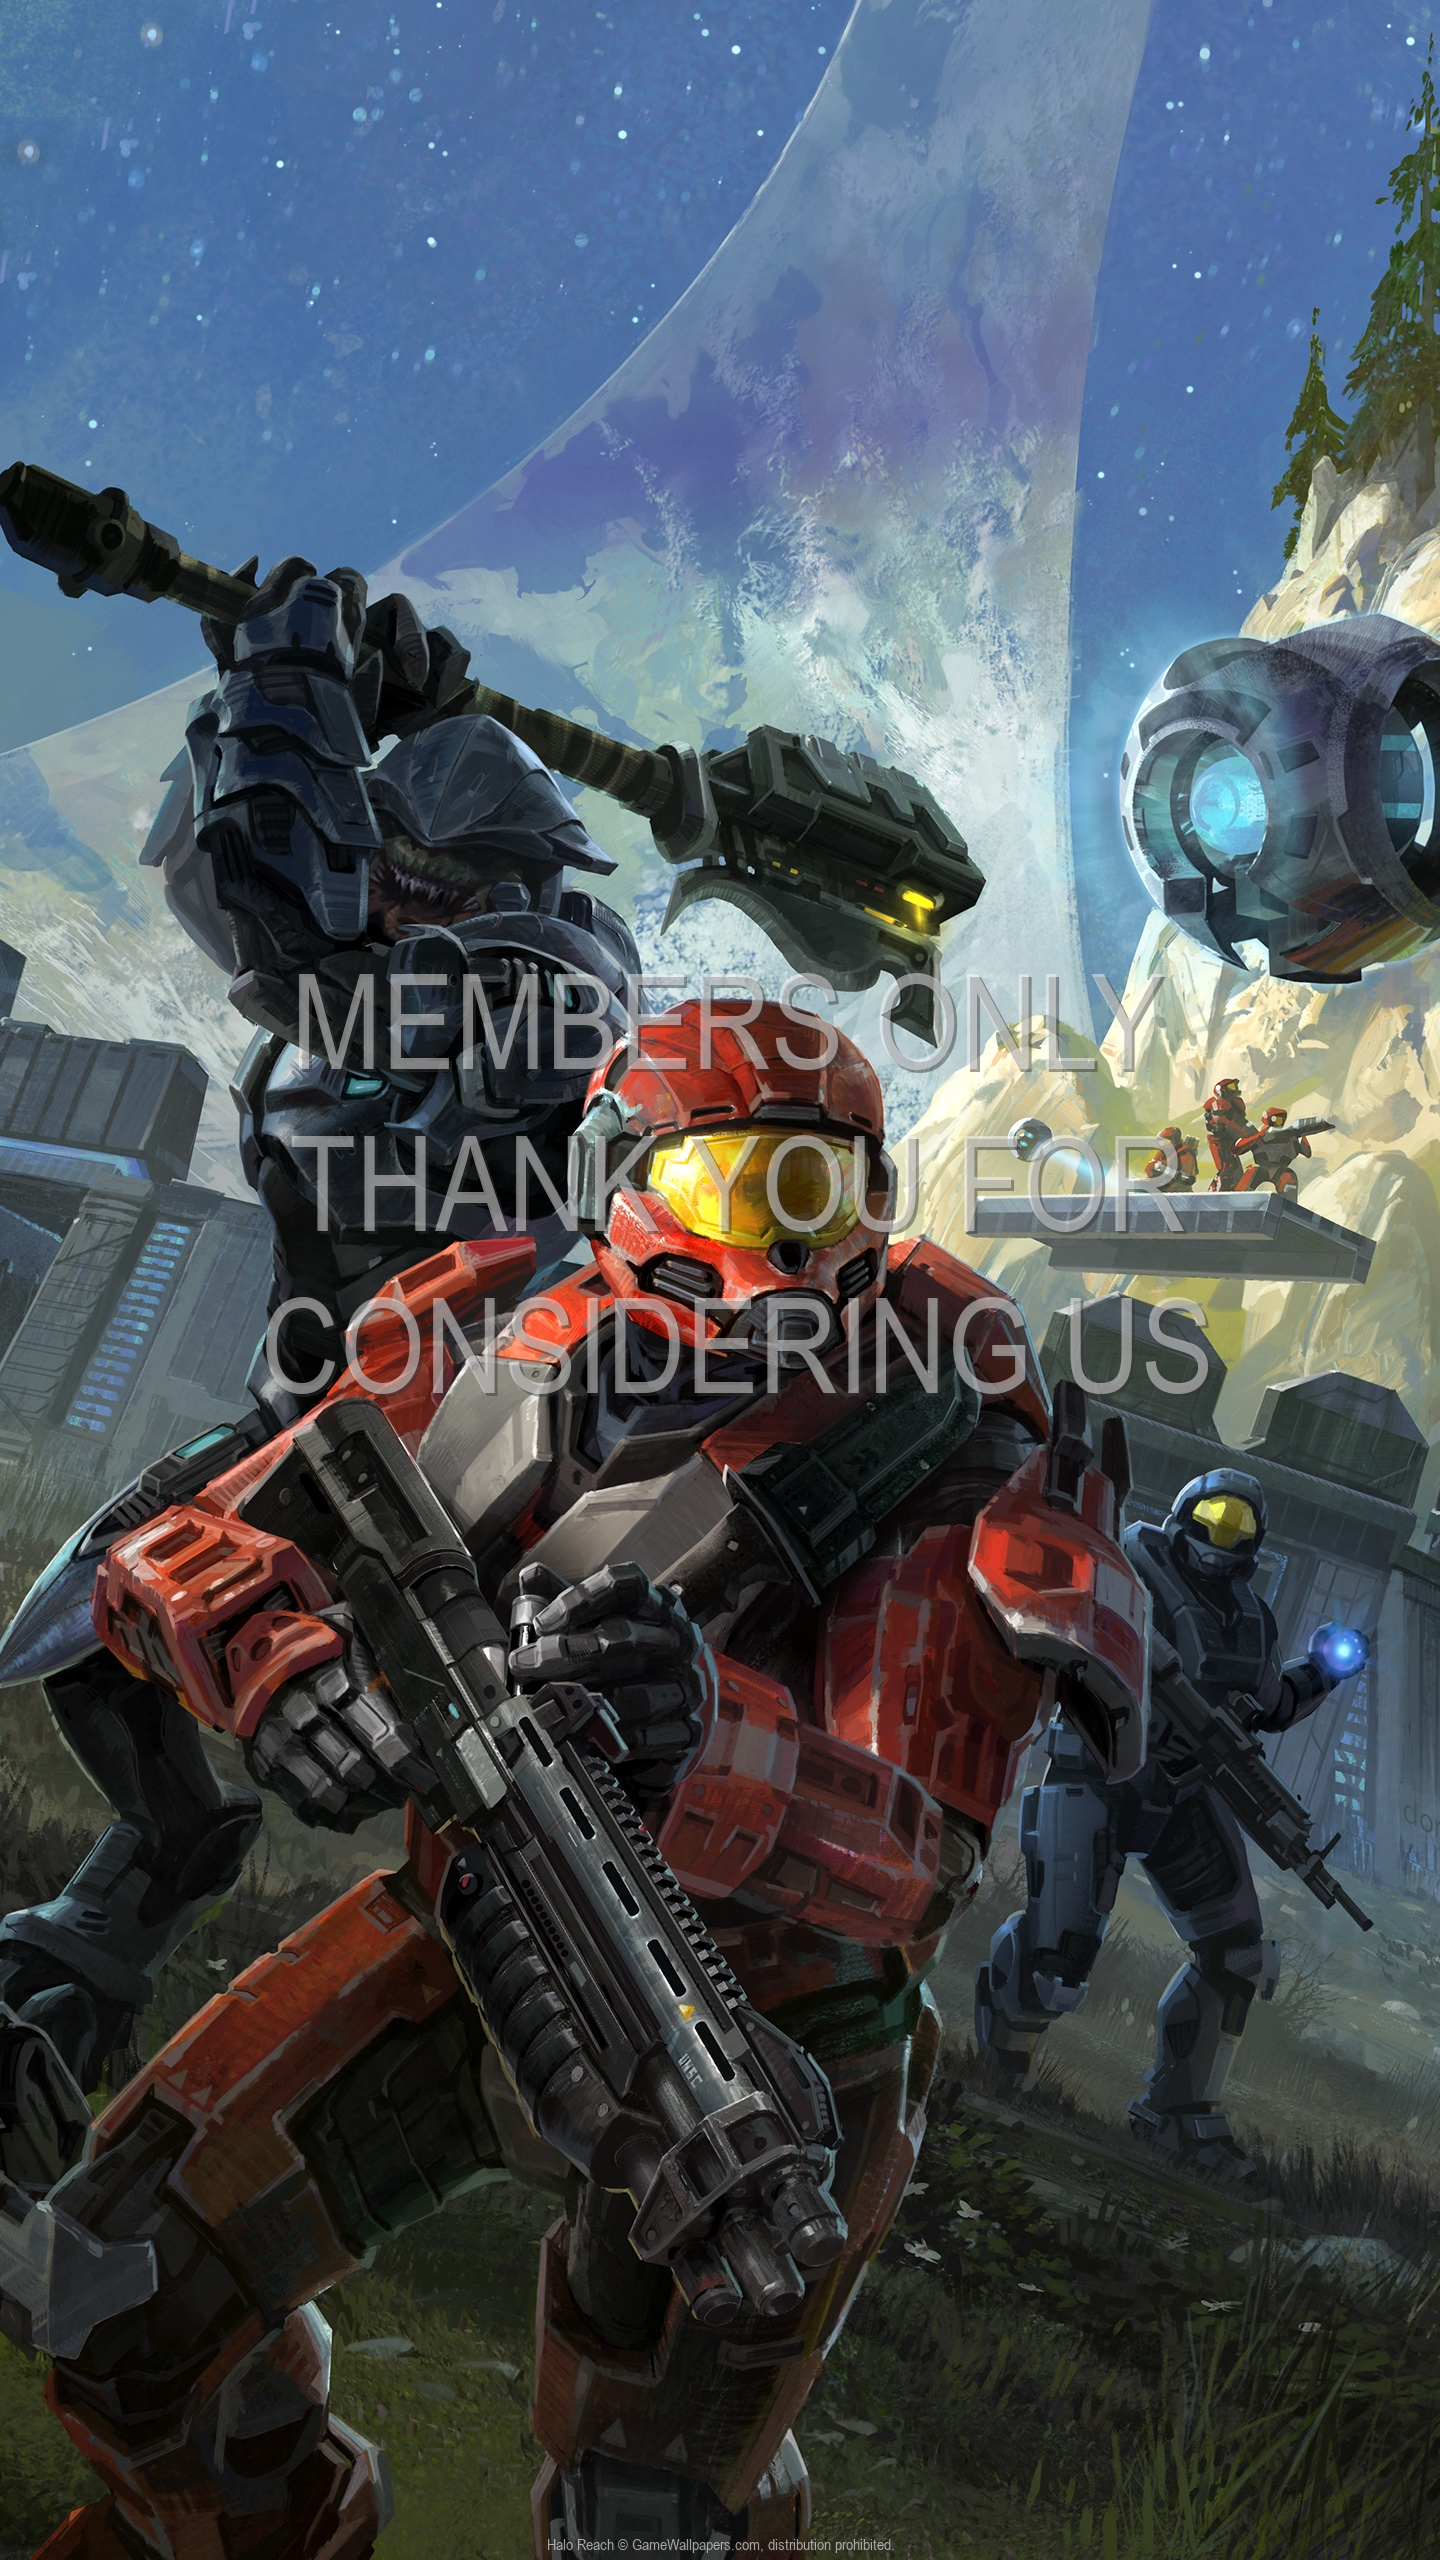 Halo: Reach 1920x1080 Handy Hintergrundbild 08